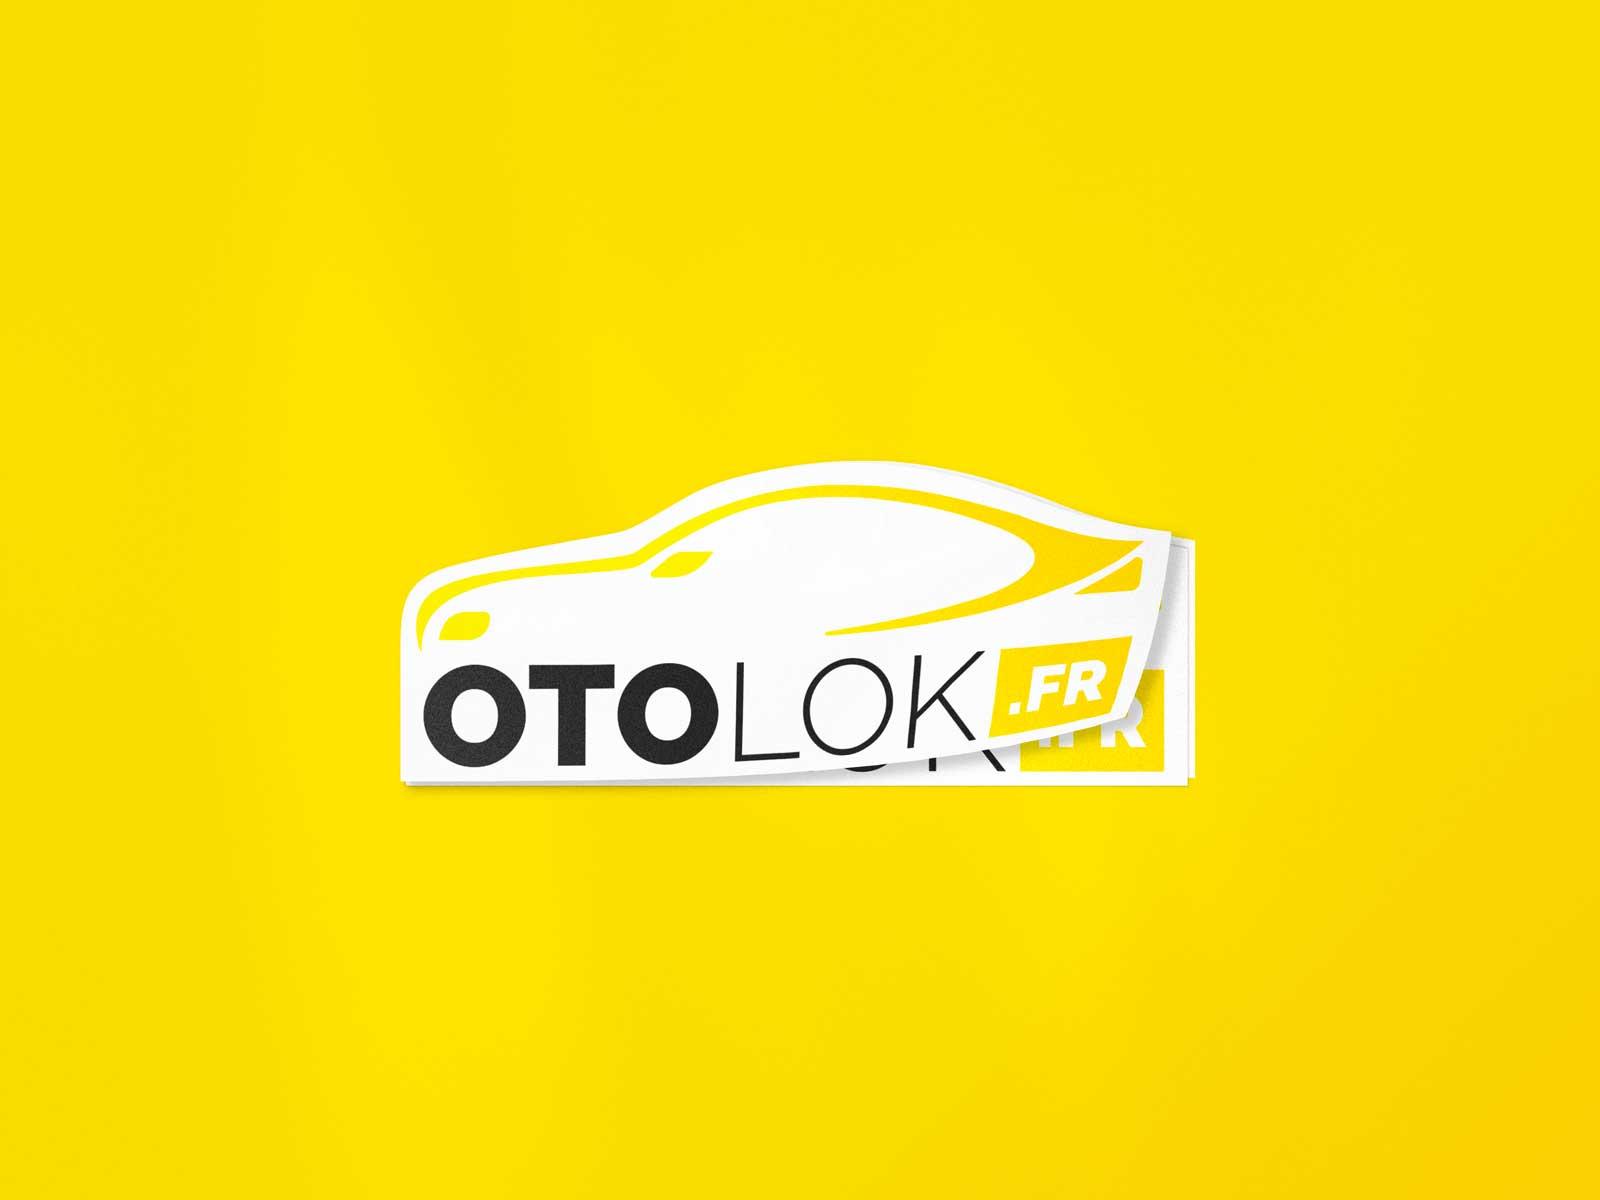 otolok.fr – logo